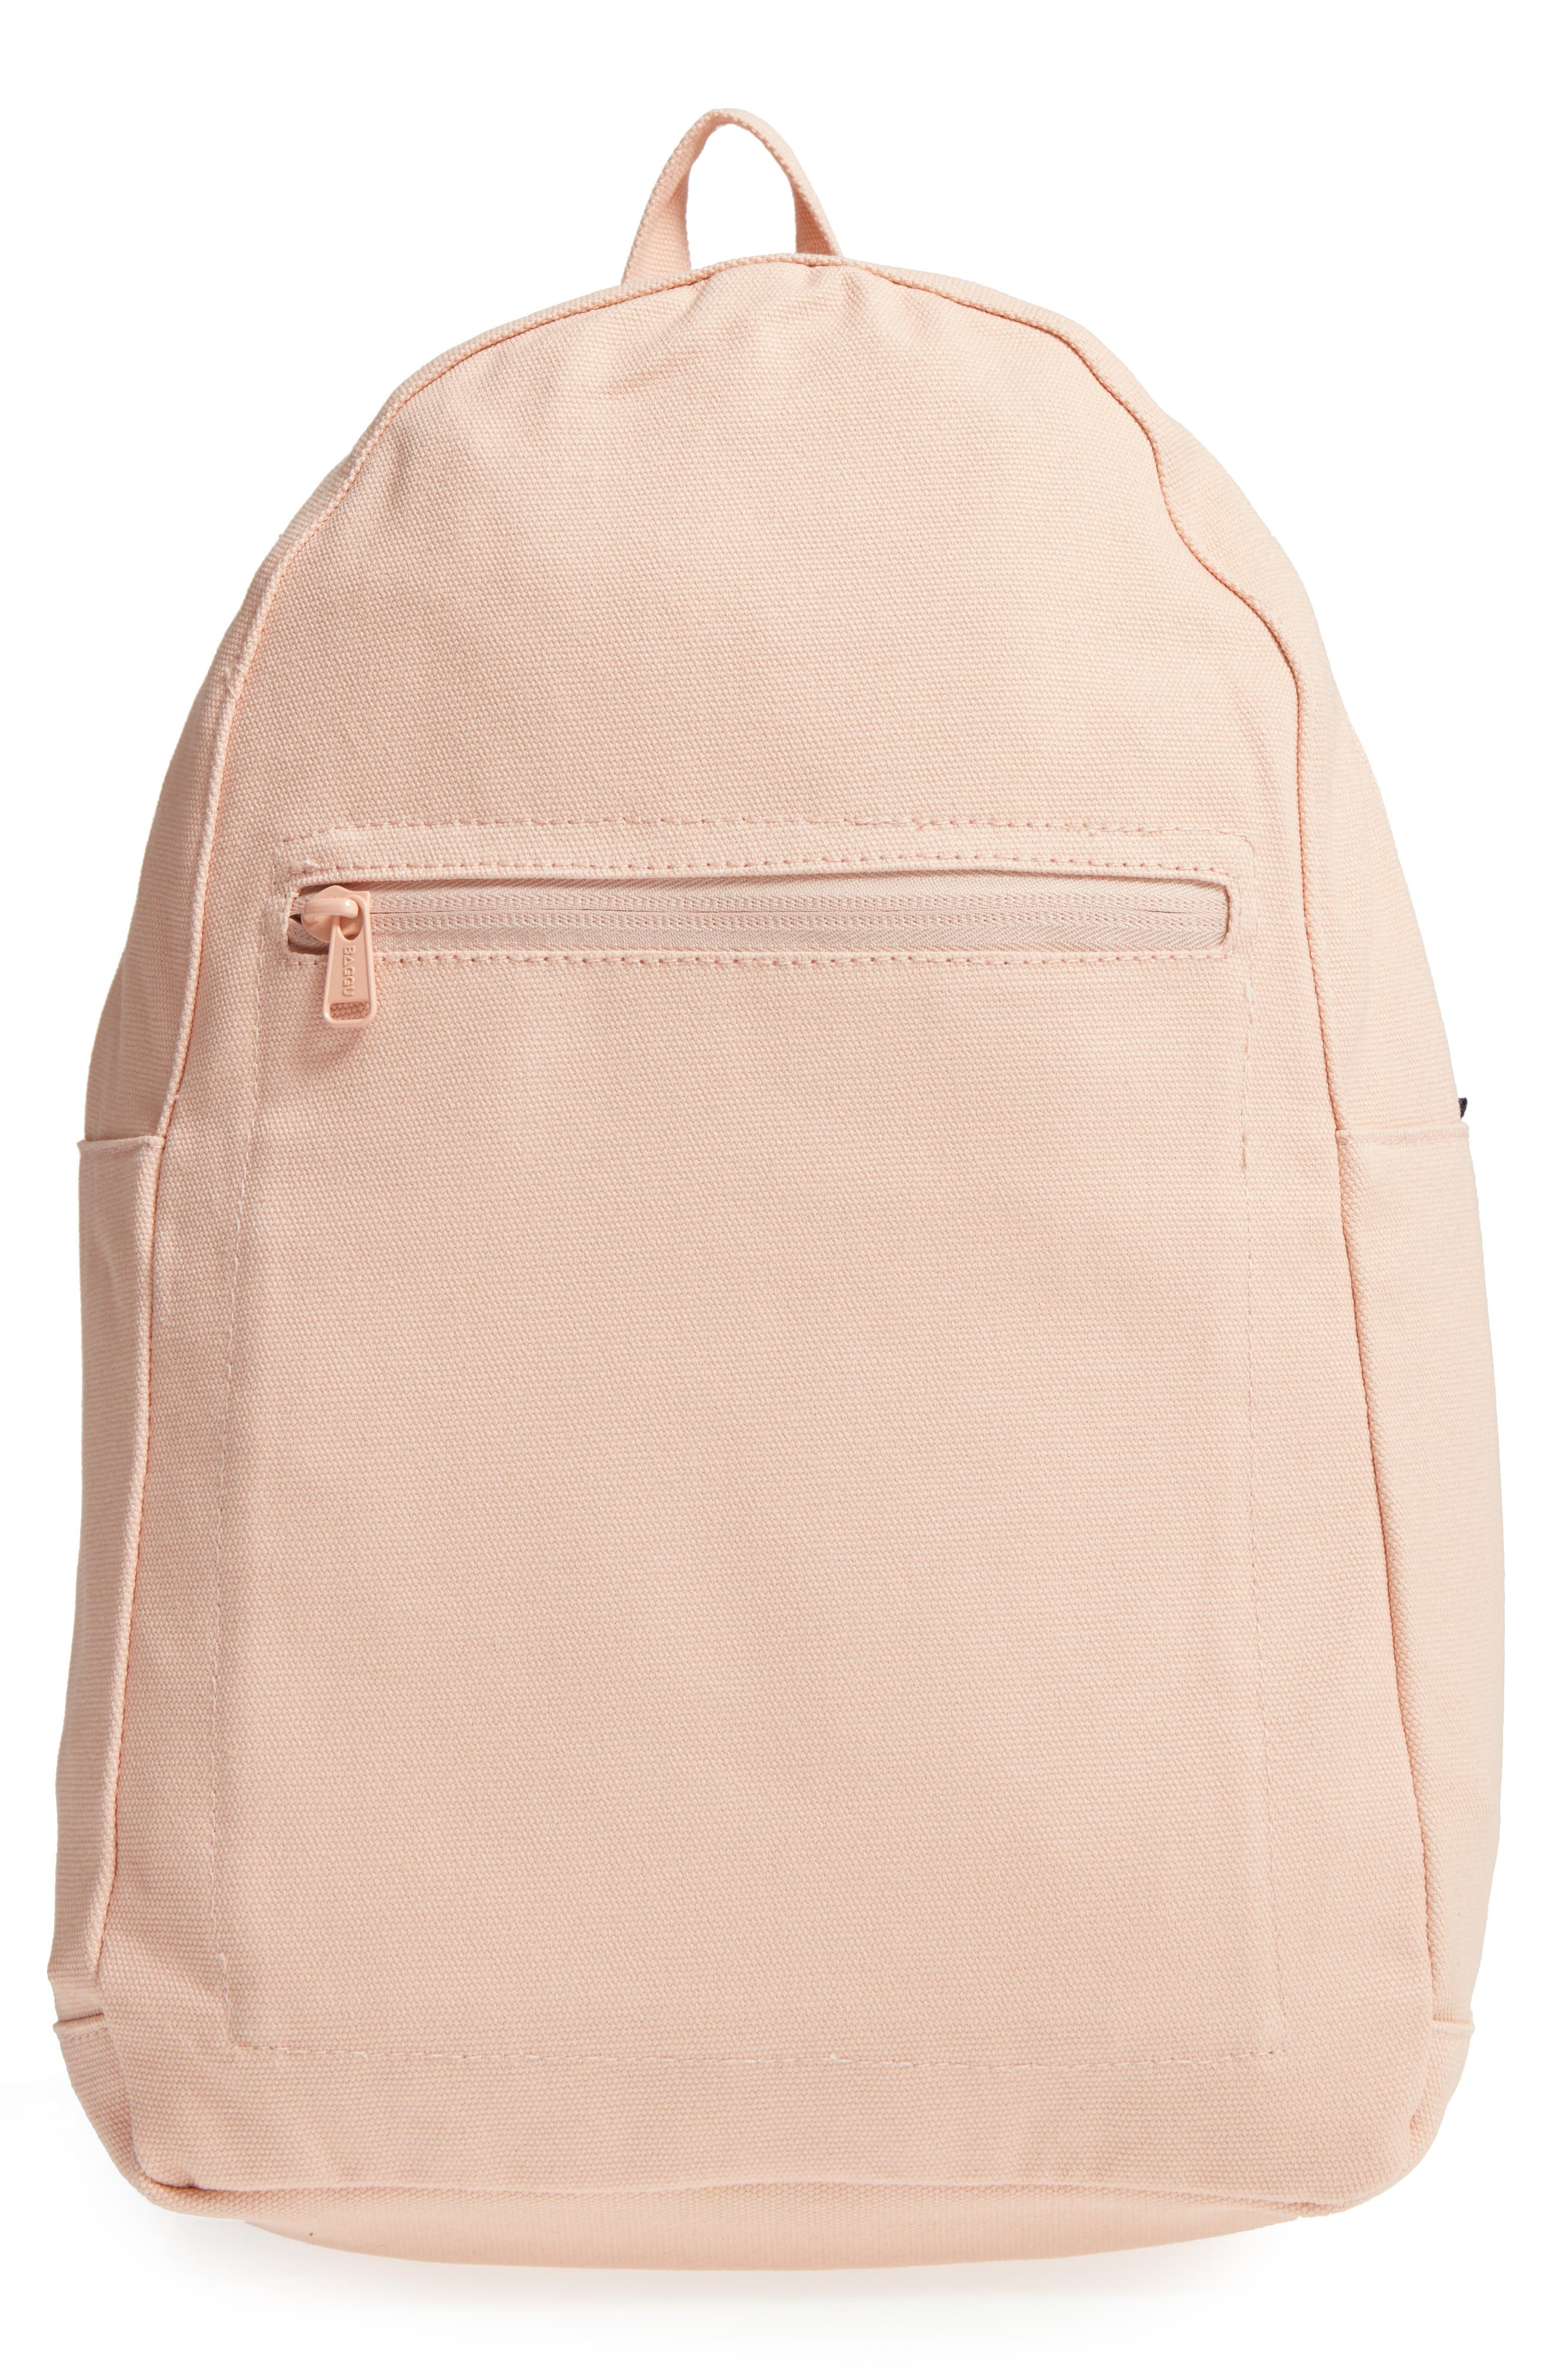 Alternate Image 1 Selected - Baggu Canvas Backpack